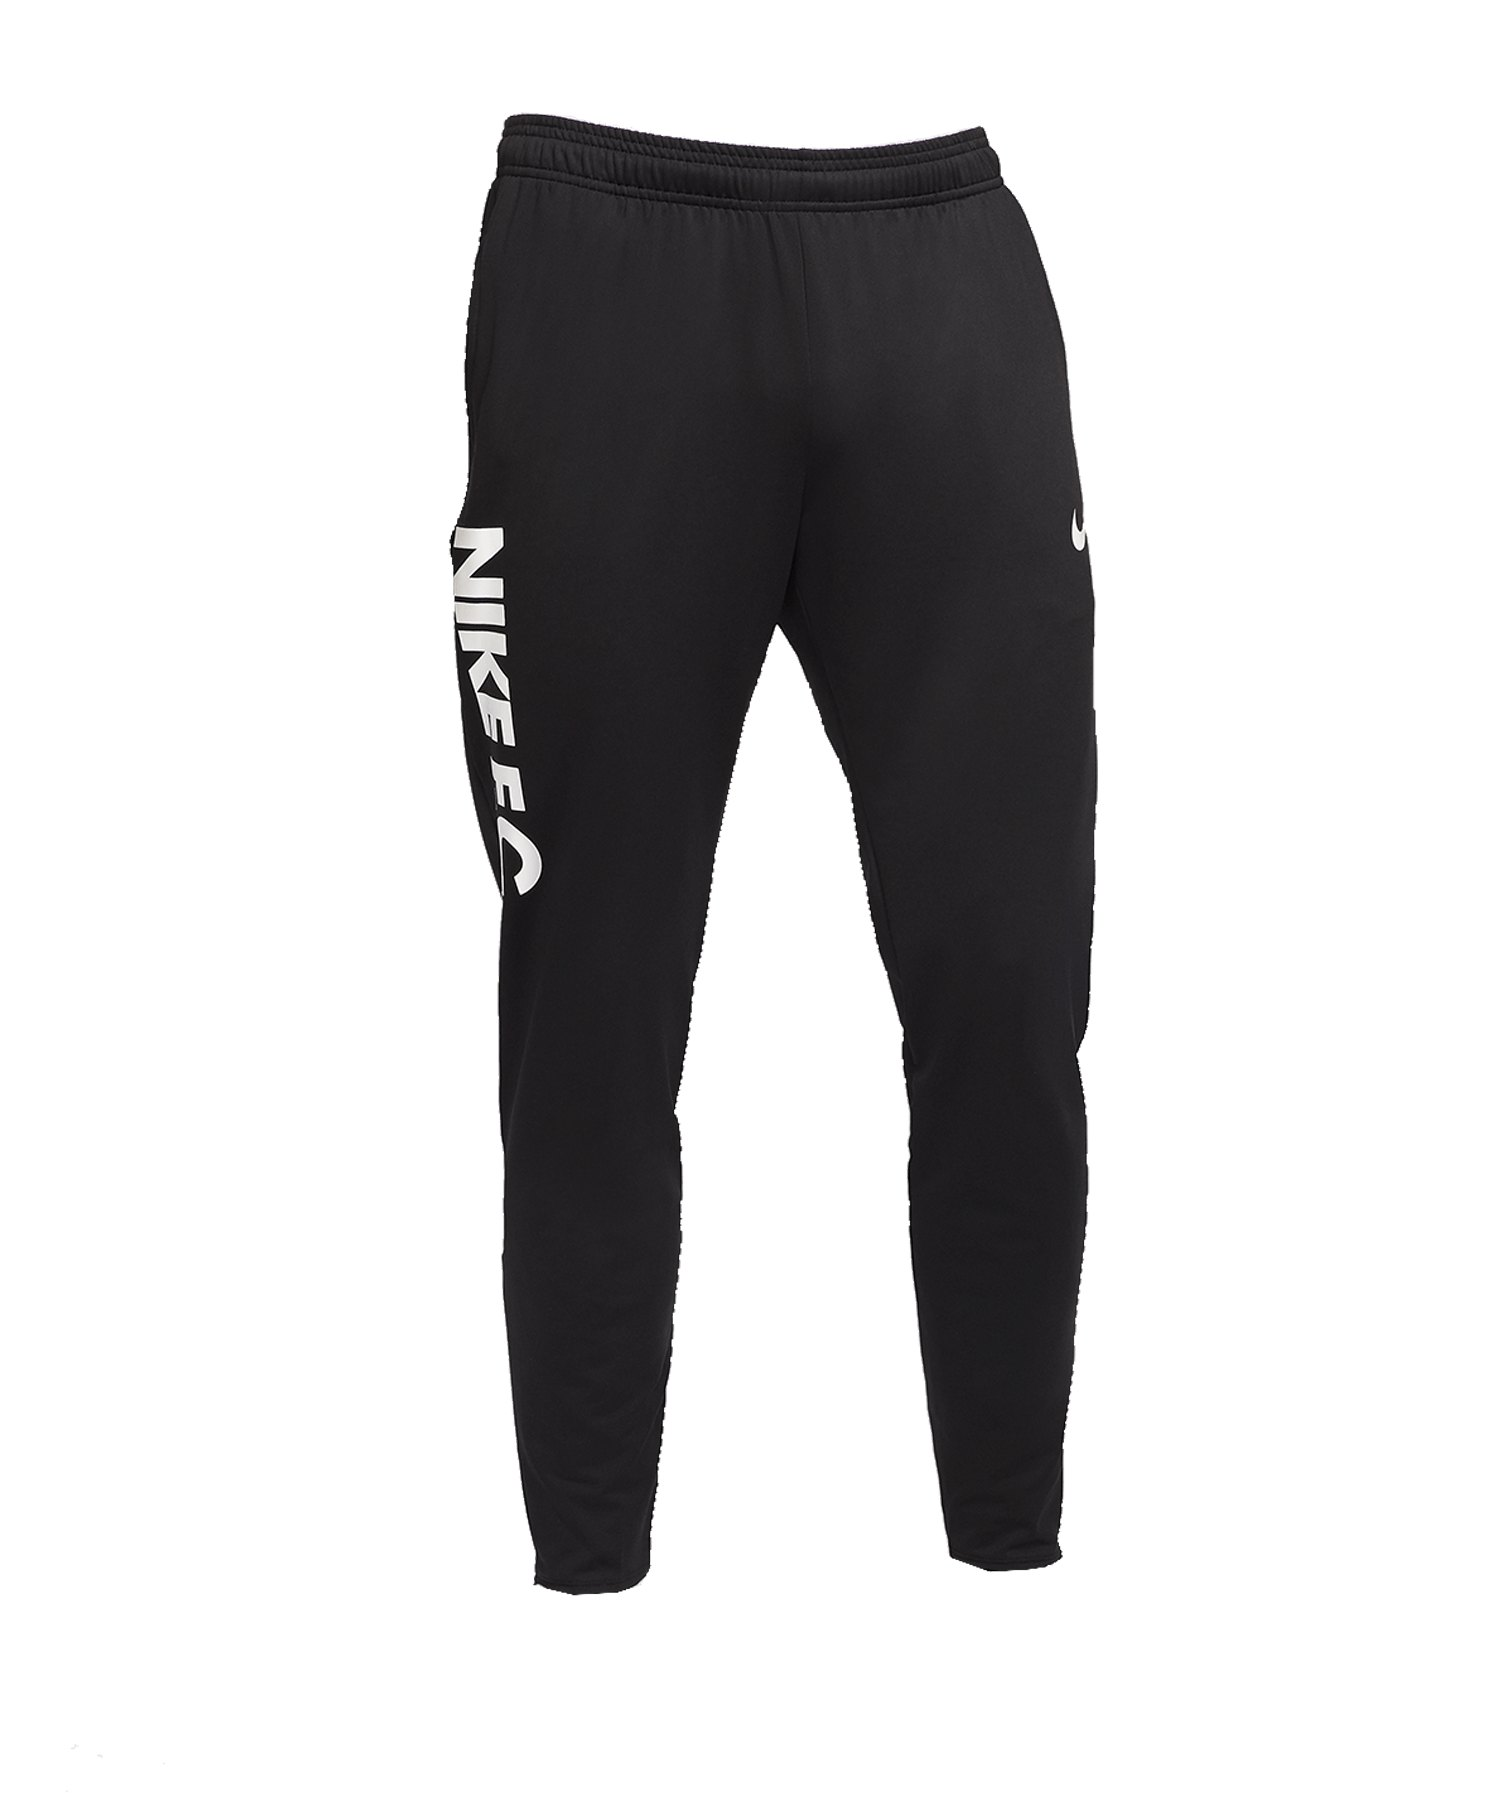 Nike F.C. Essential Jogginghose Schwarz F010 - schwarz